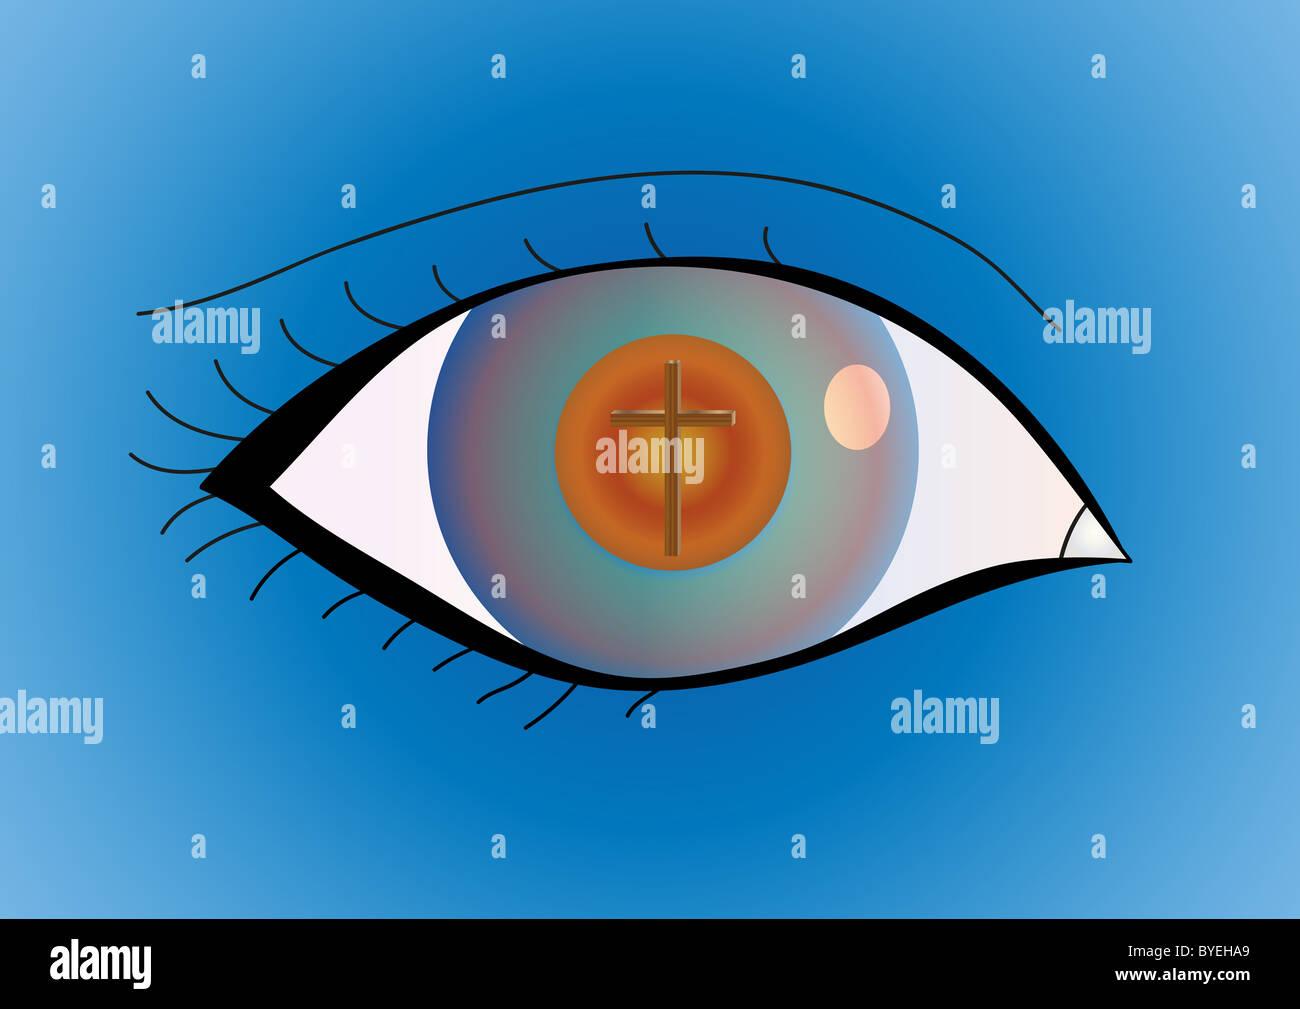 All seeing eye of god stockfotos all seeing eye of god bilder alamy - Christliche hintergrundbilder ...